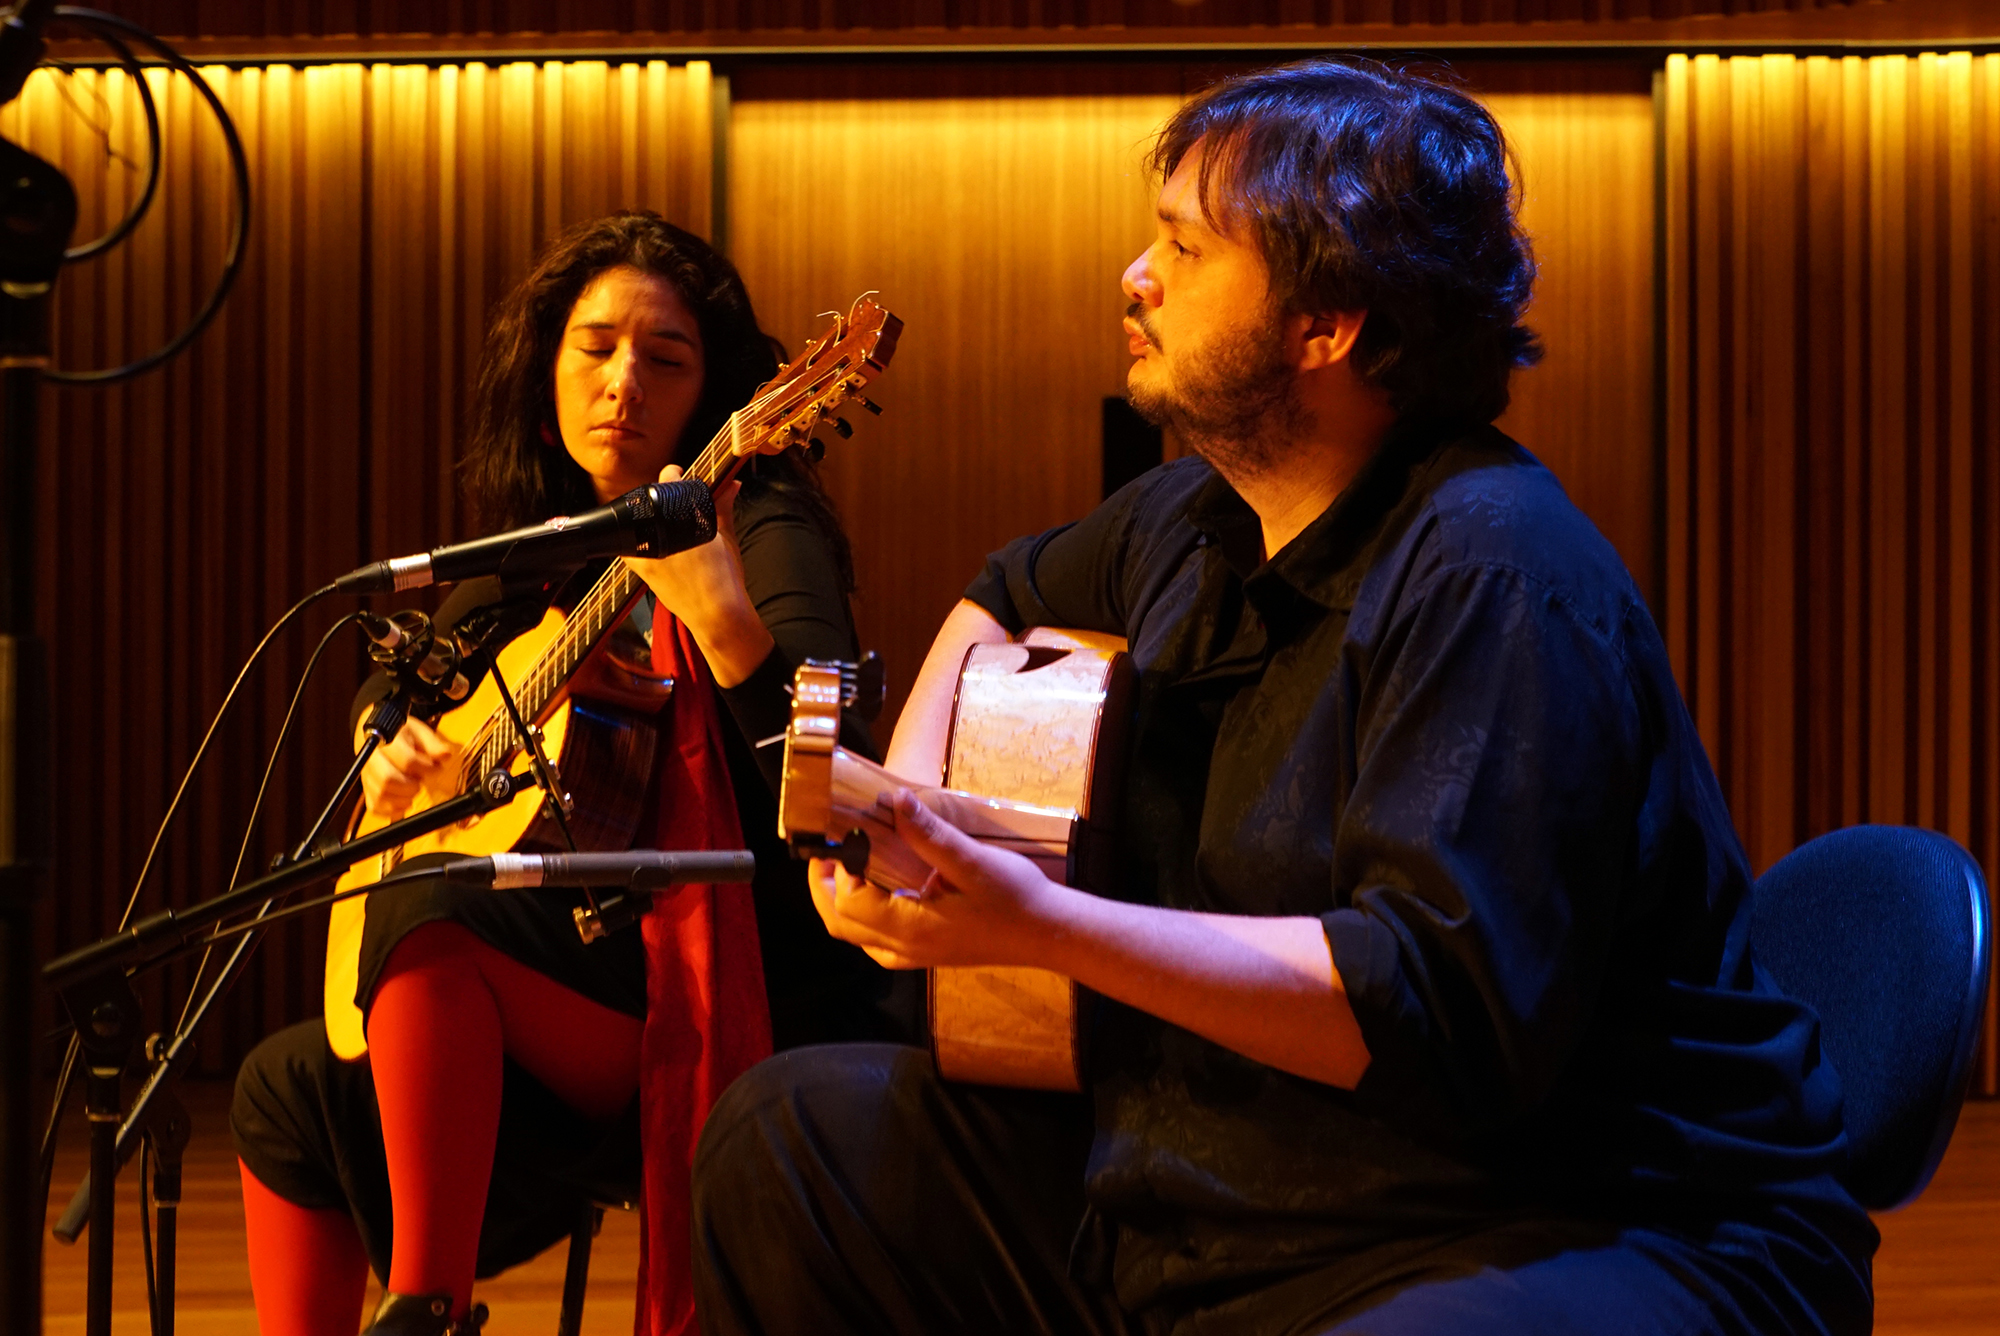 DSC04334_CC1 Elodie and Yamandu.jpg